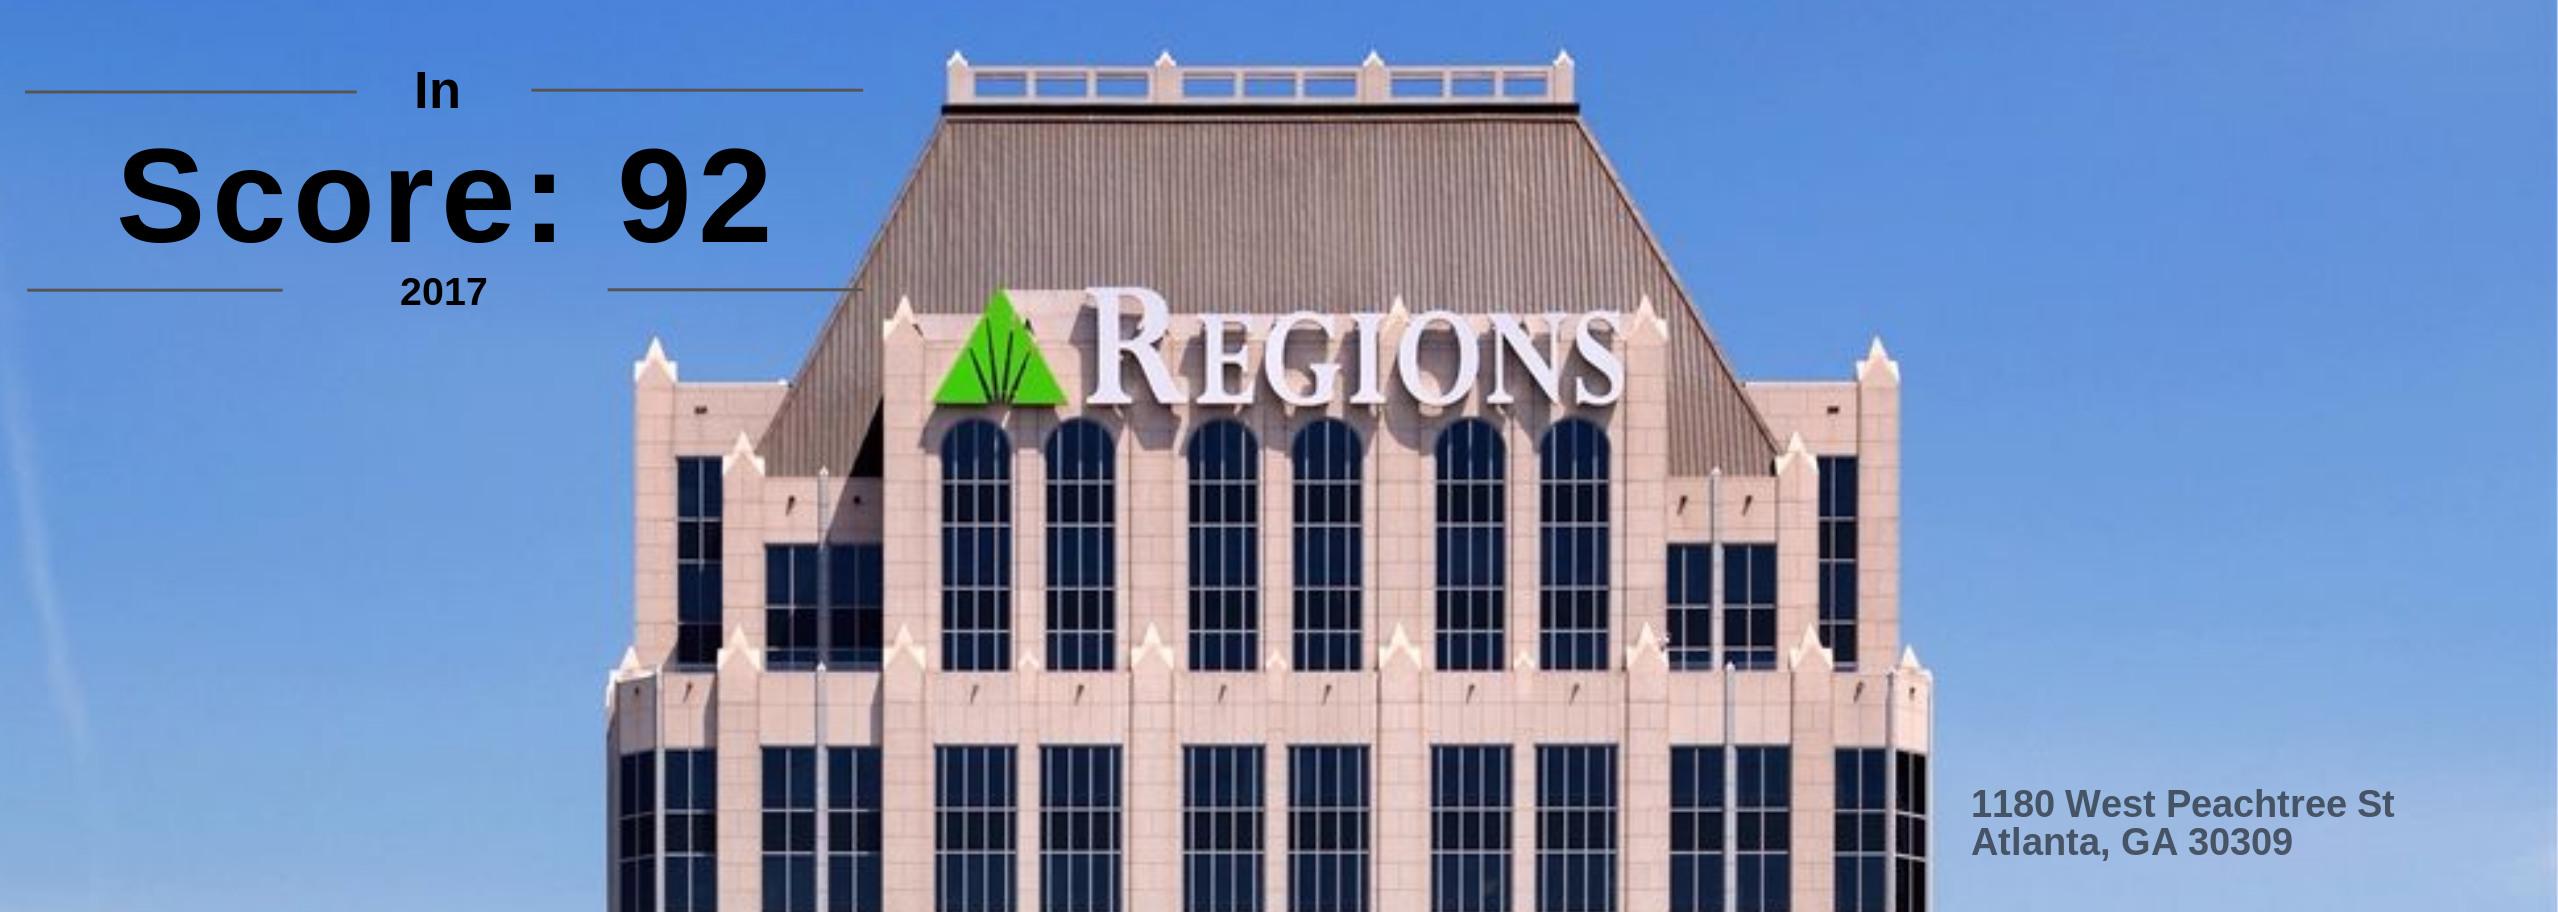 Regions Plaza Banner